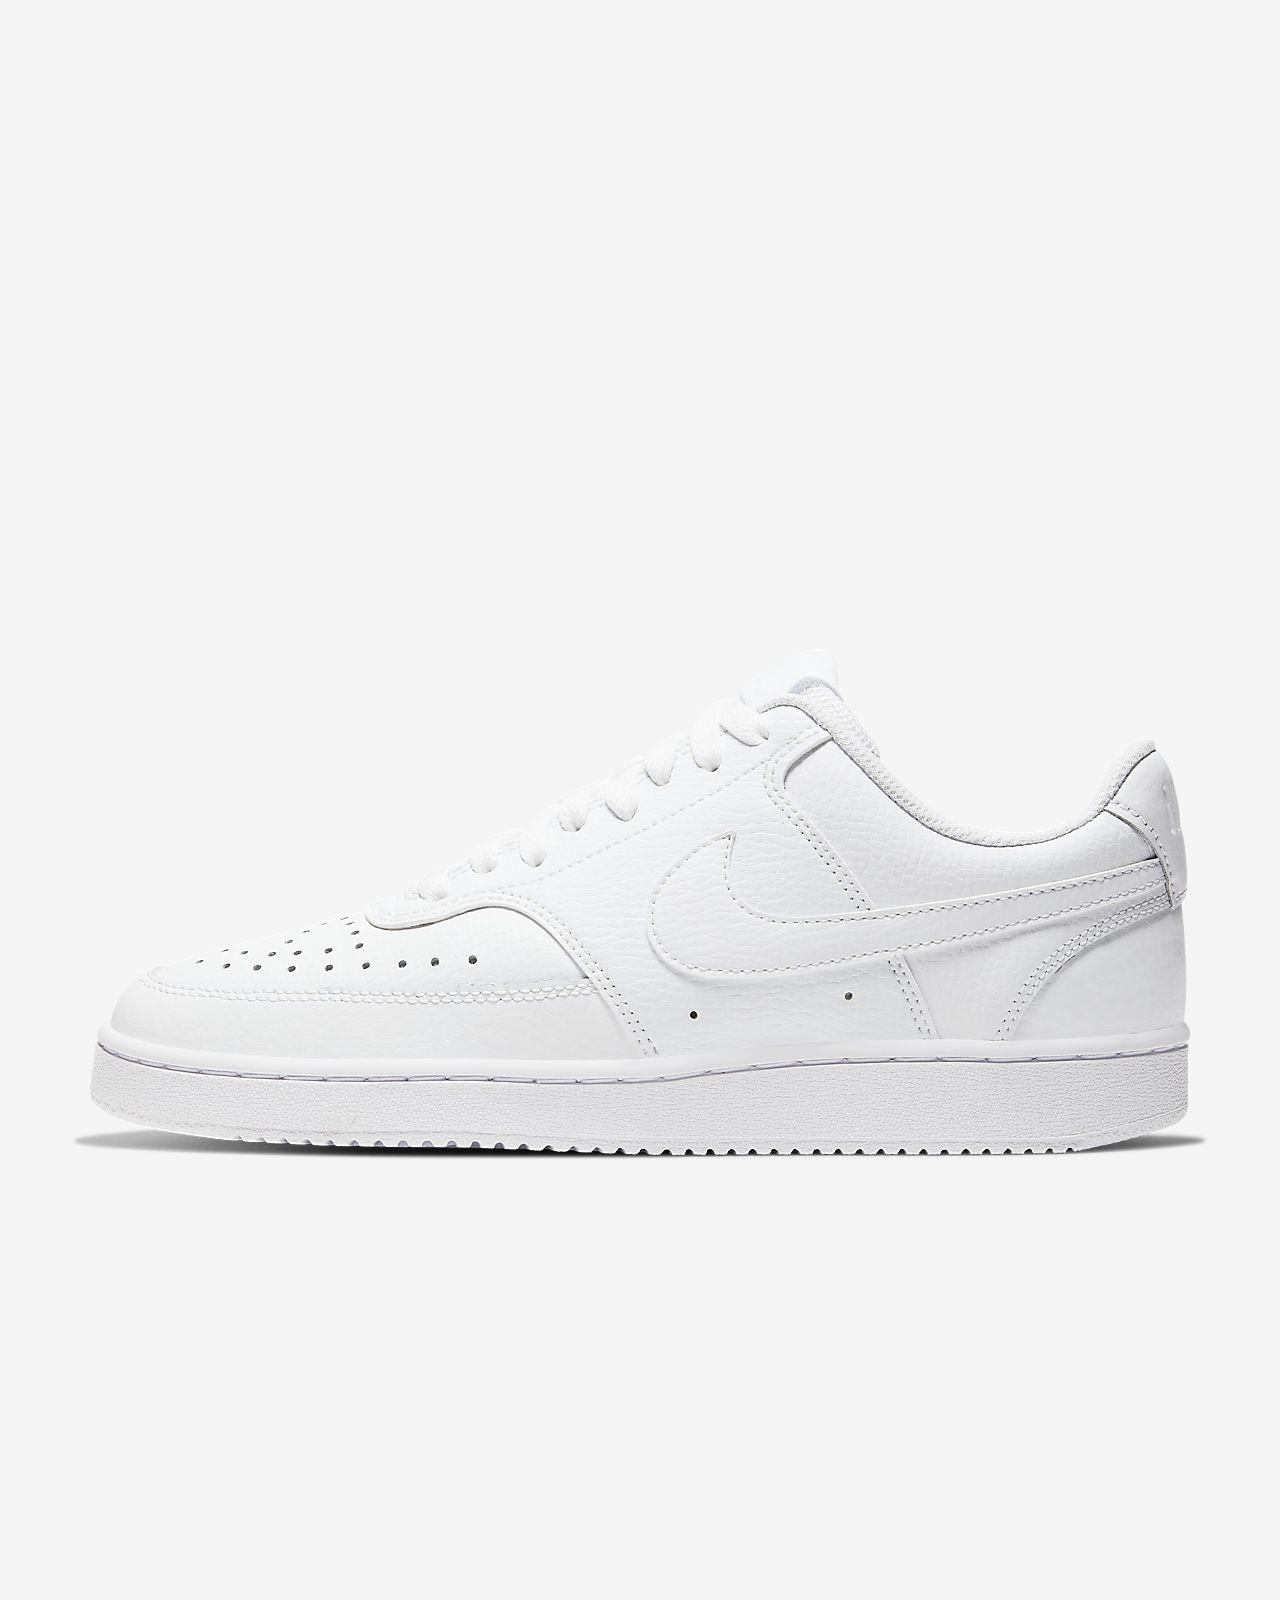 NikeCourt Vision Low Women's Shoe